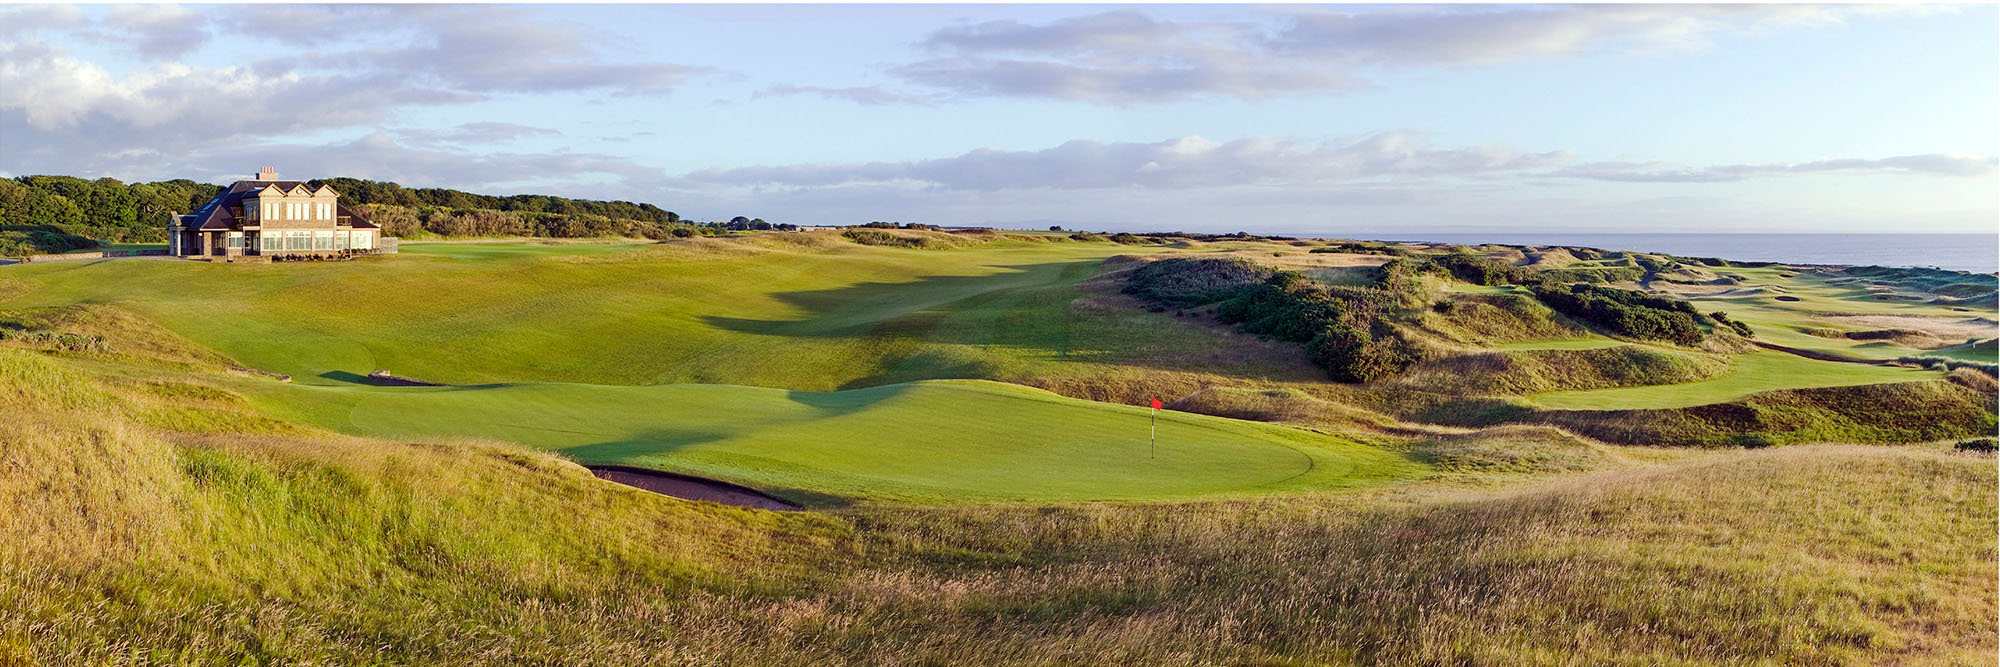 Golf Course Image - Kingsbarns No. 18